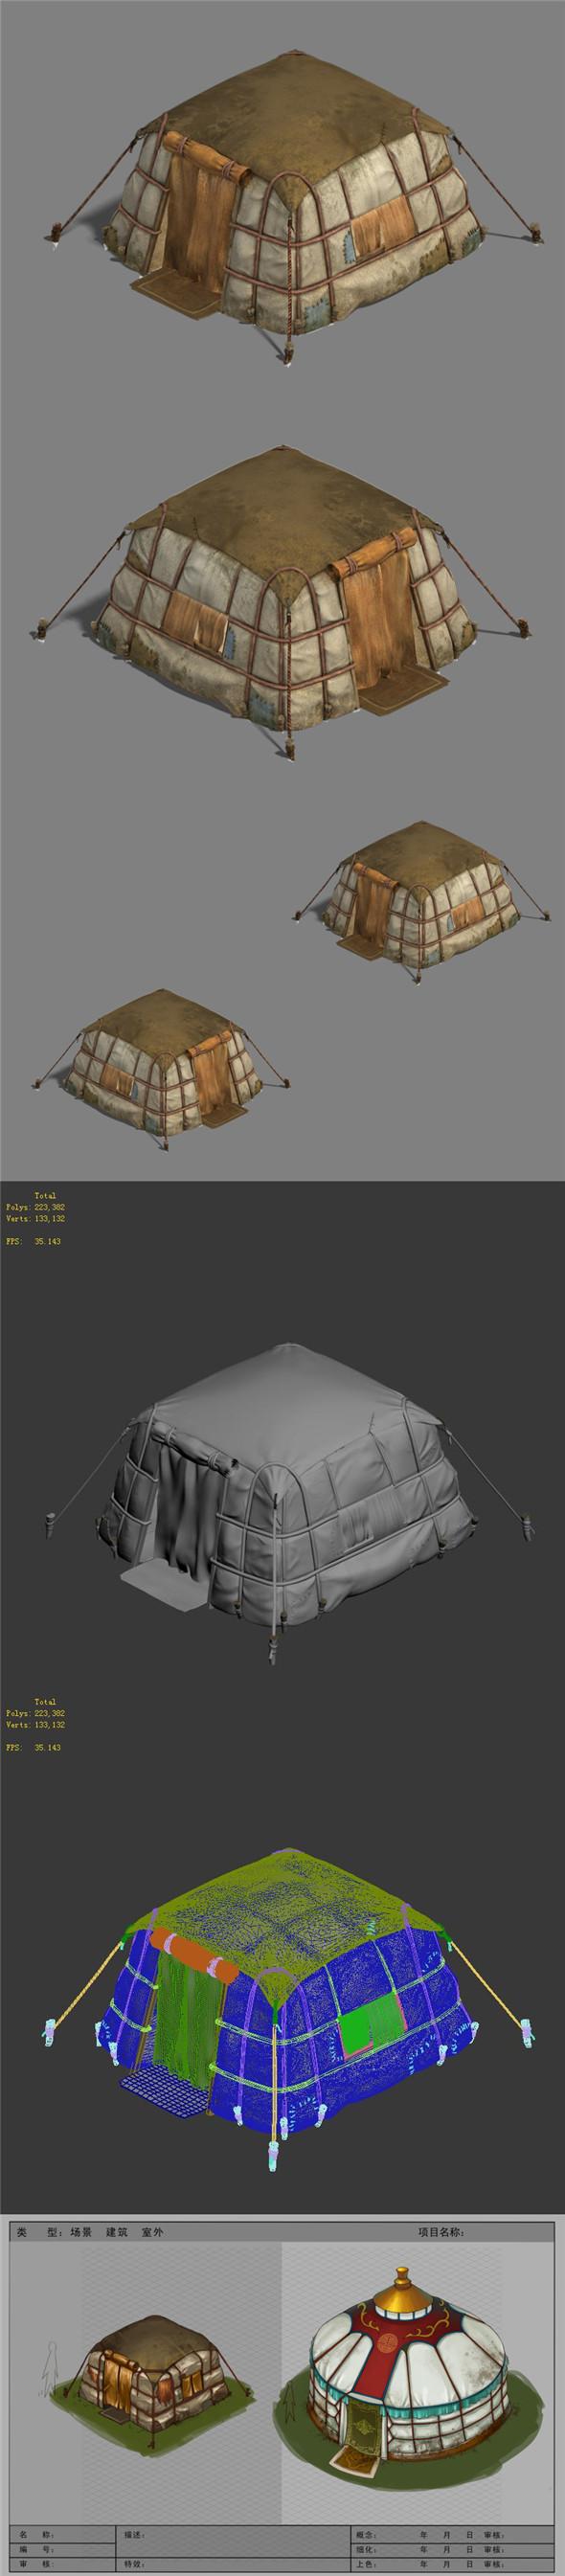 Asakusa - yurts tents - 3DOcean Item for Sale